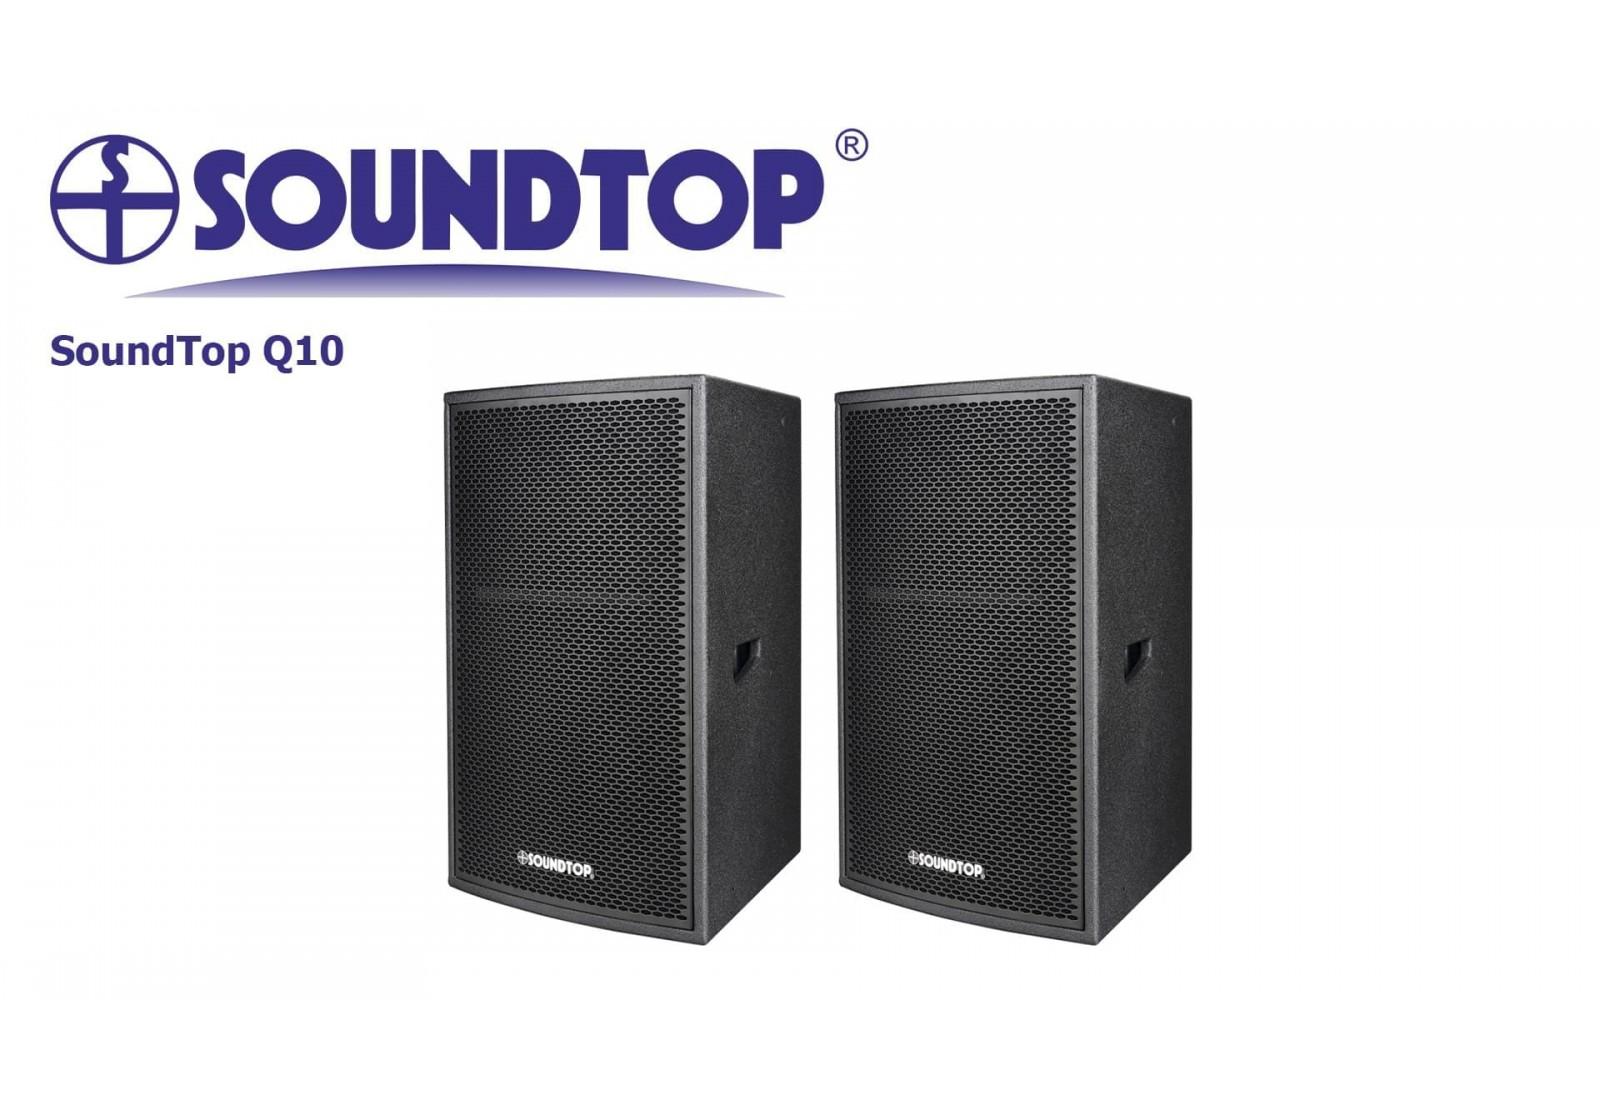 SoundTop Q10